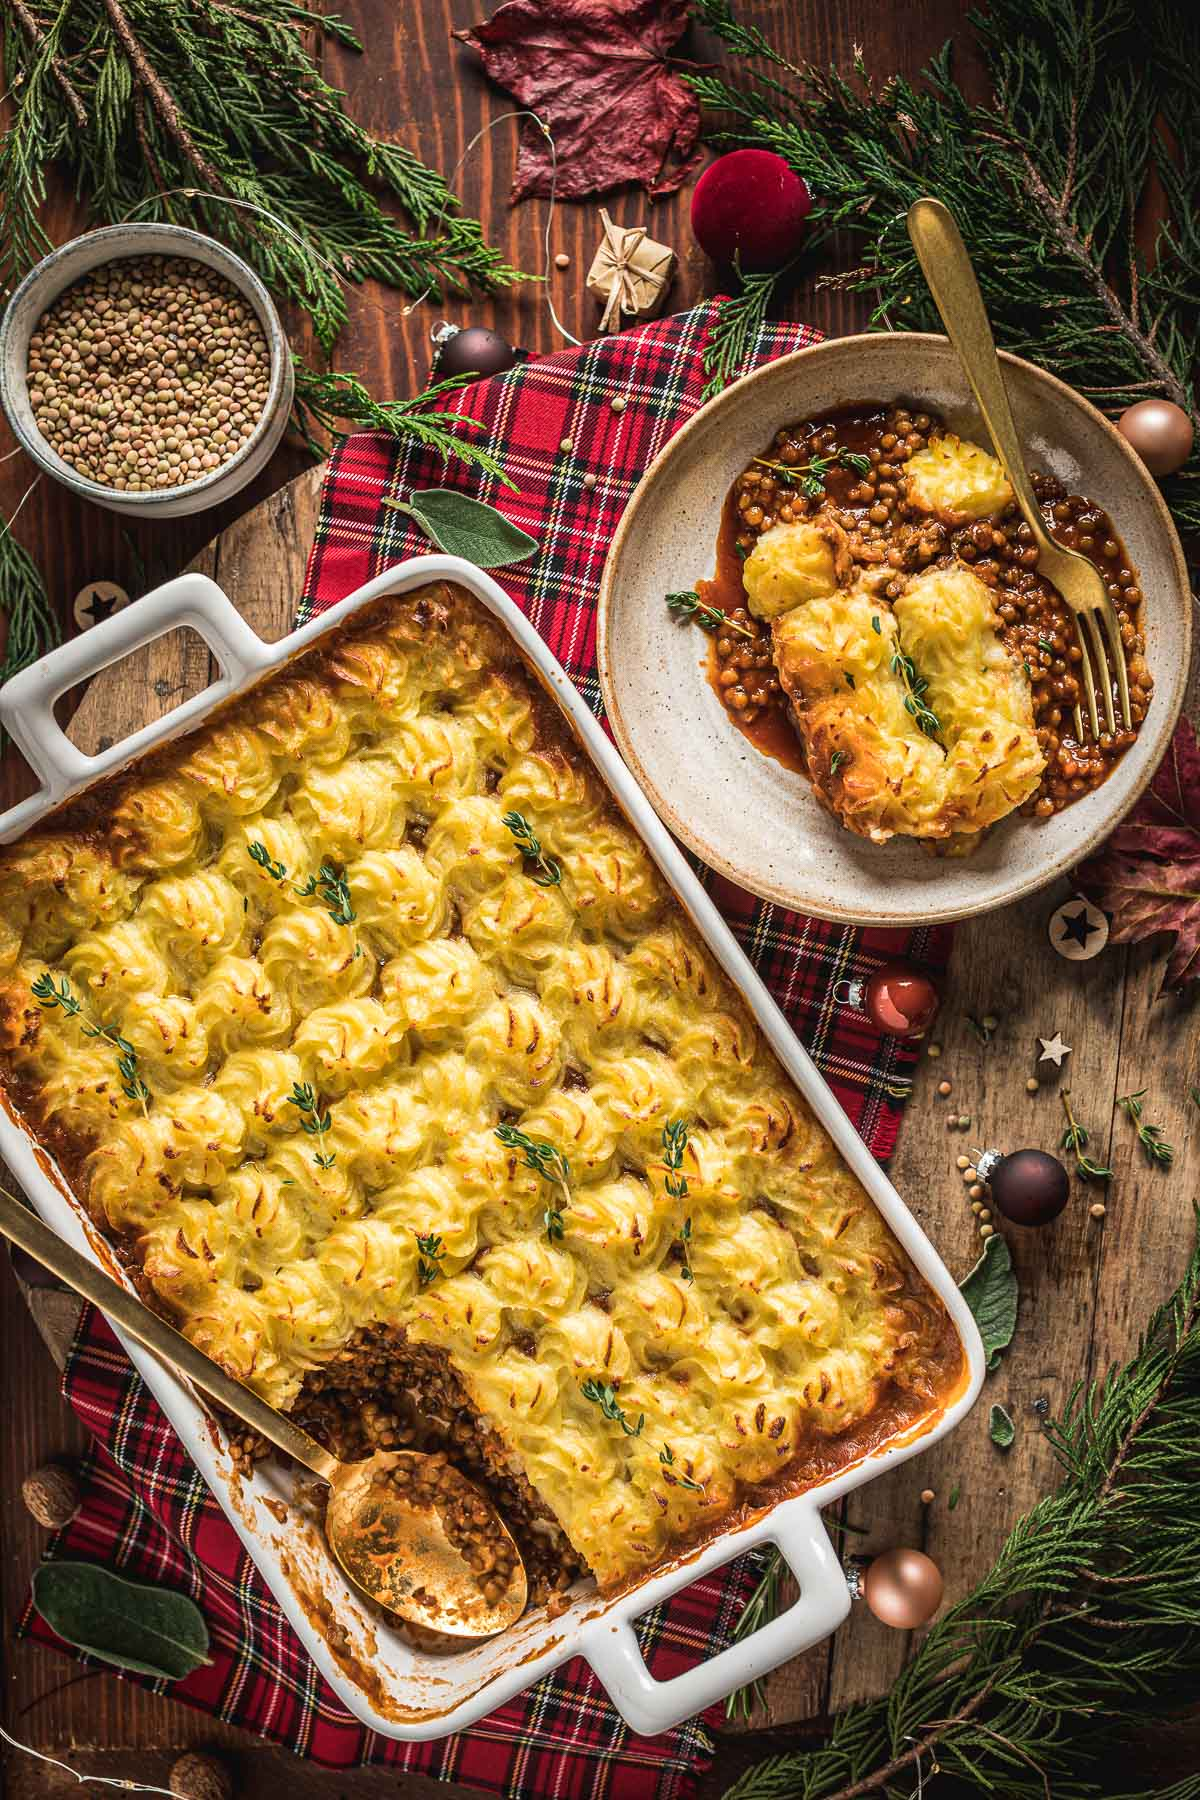 healthy Vegan Shepherd's Pie recipe with lentil ragu for Thanksgiving ricetta di Natale Shepherd's Pie vegan di lenticchie con ragù di lenticchie funghi